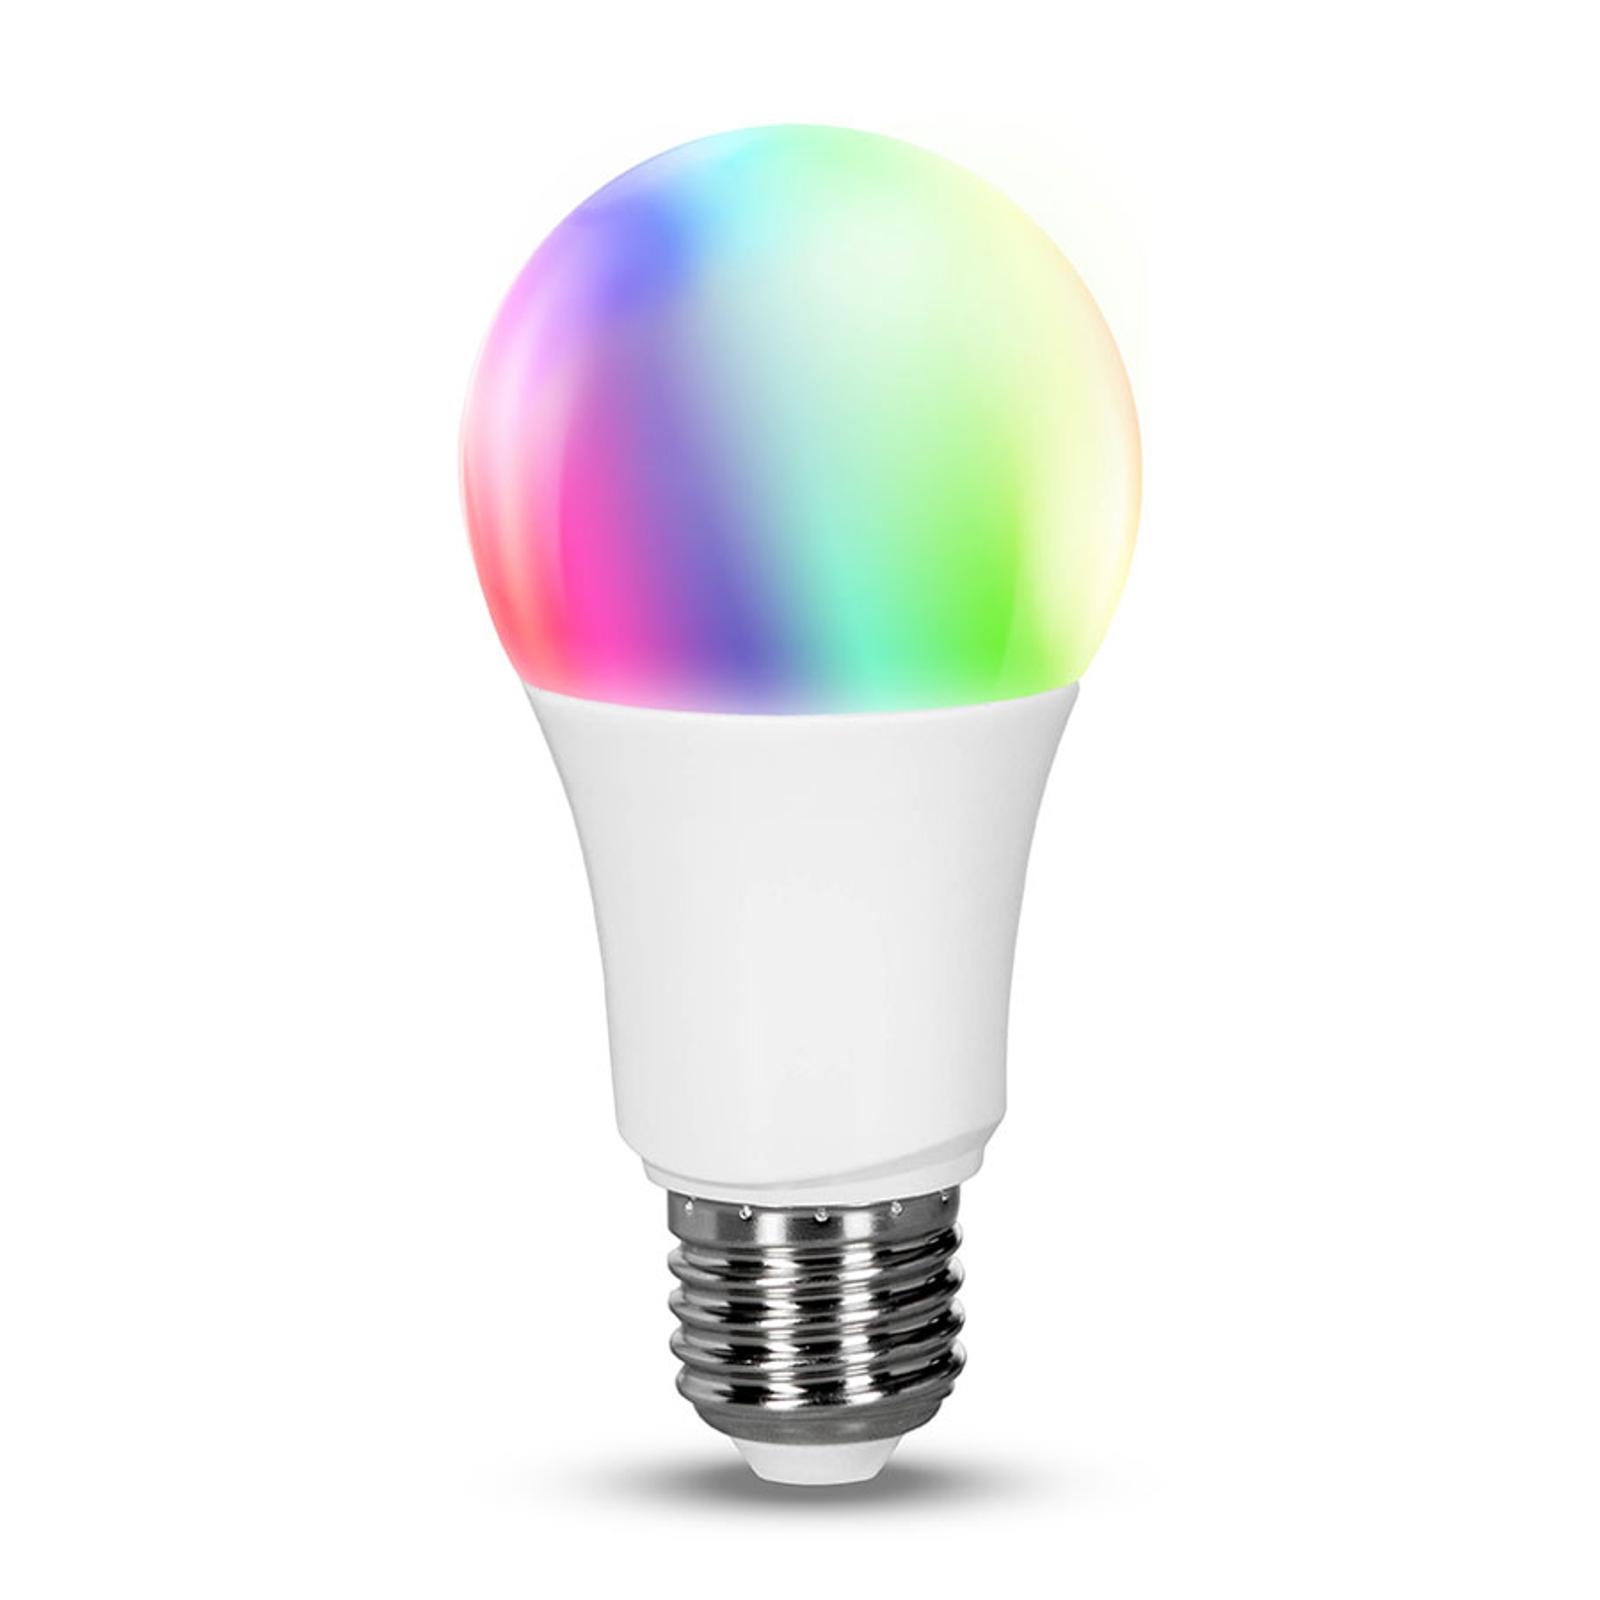 Müller licht tint white+color LED lamp E27 9,5 W